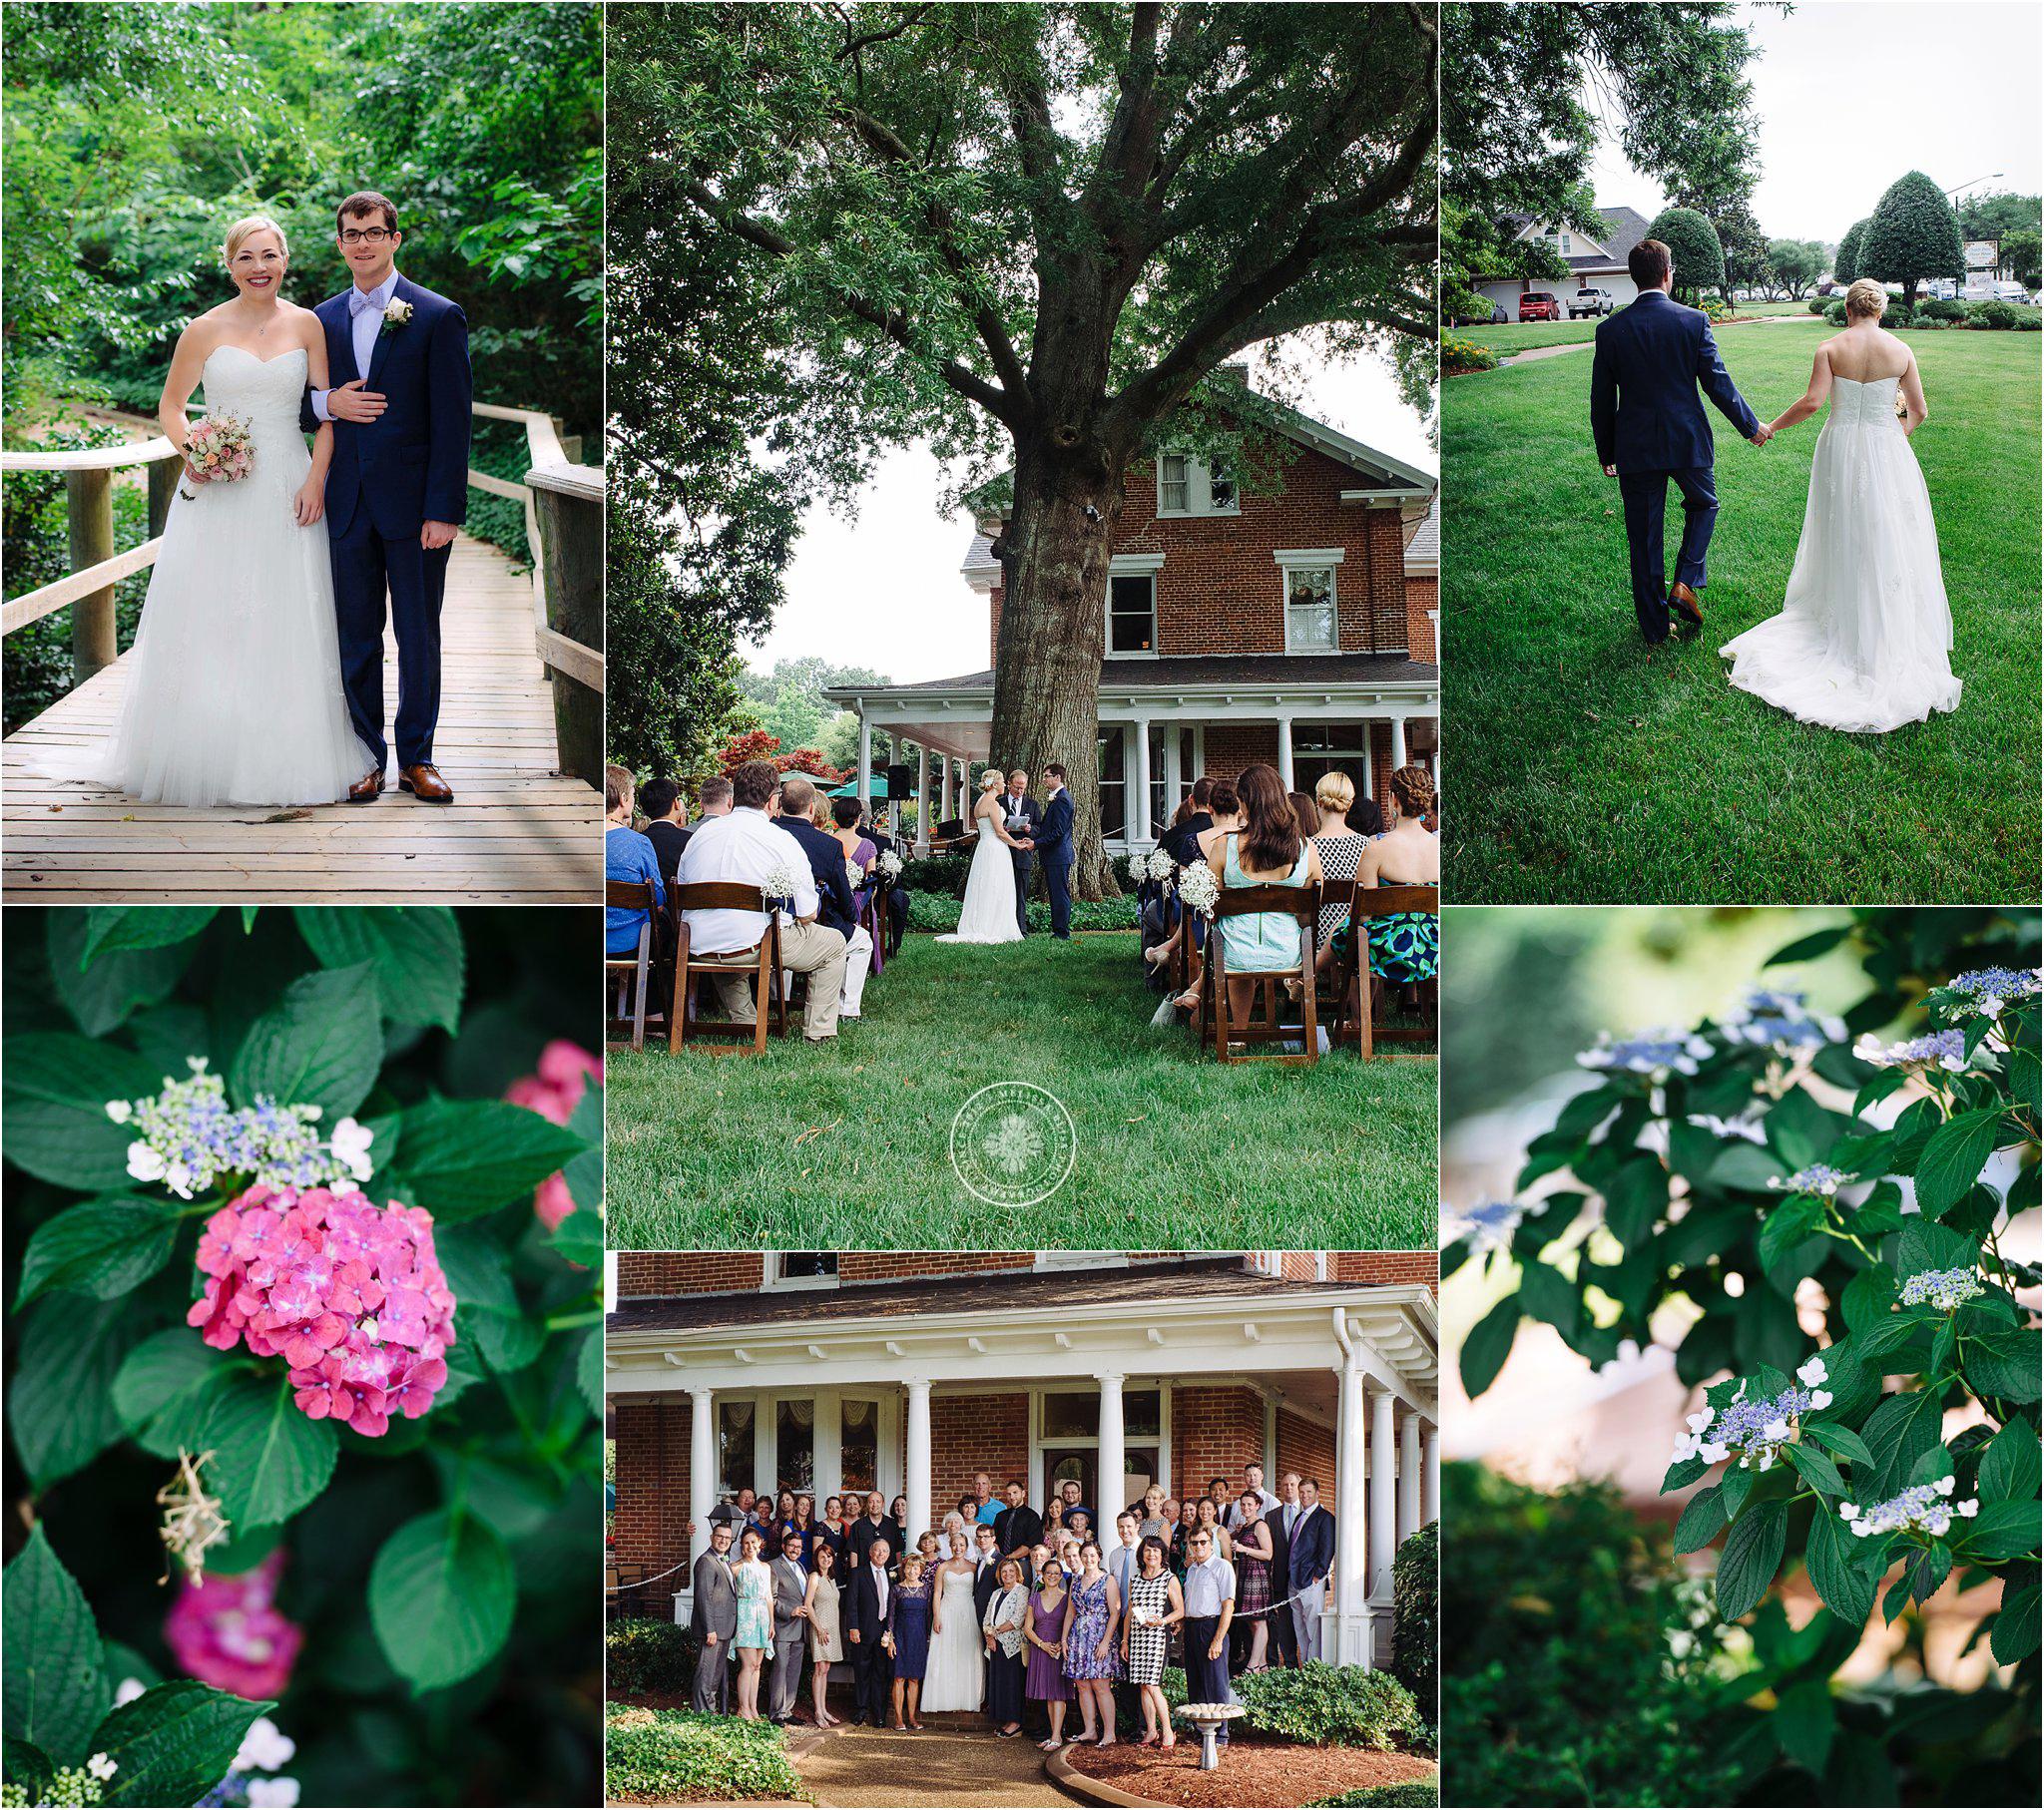 virginia-beach-wedding-photographer-church-point-manor-wedding-melissa-bliss-photography-hampton-roads-weddings